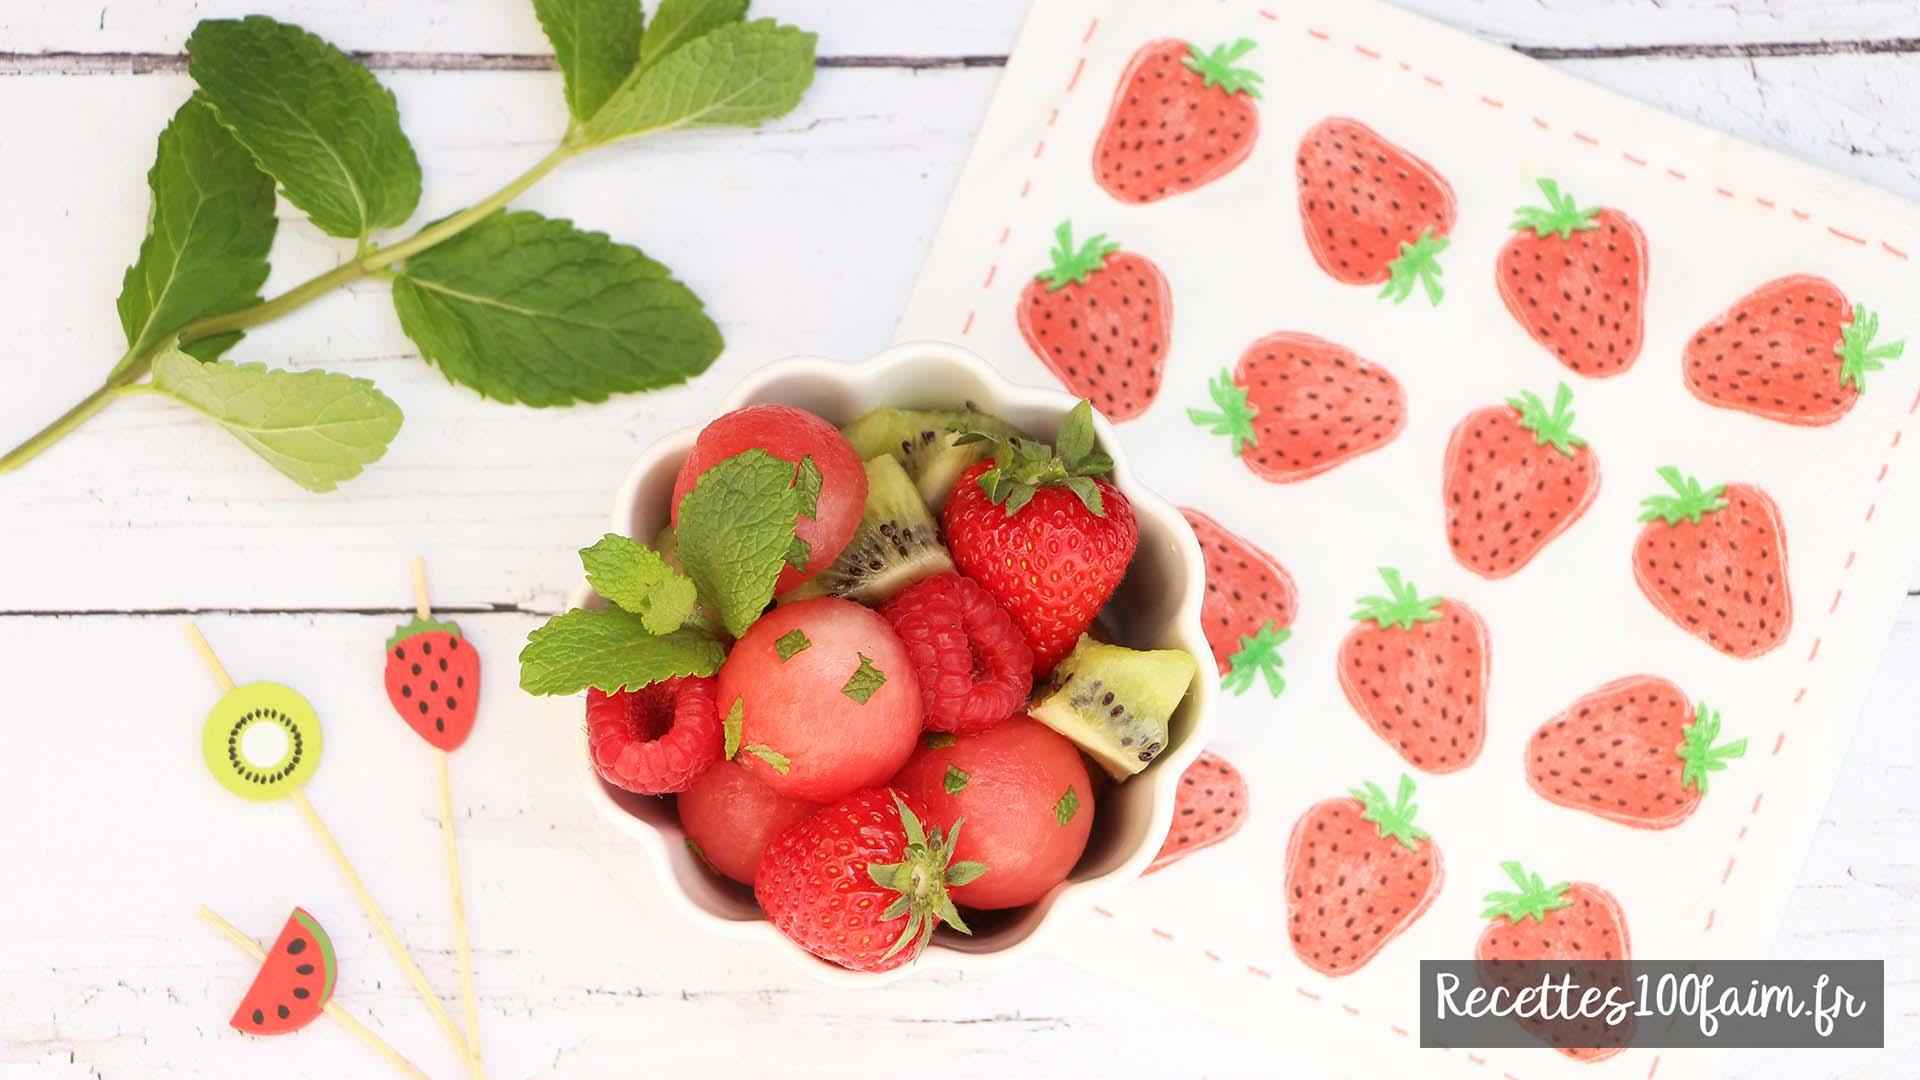 salade de fruits pasteque kiwi framboise fraise framboise